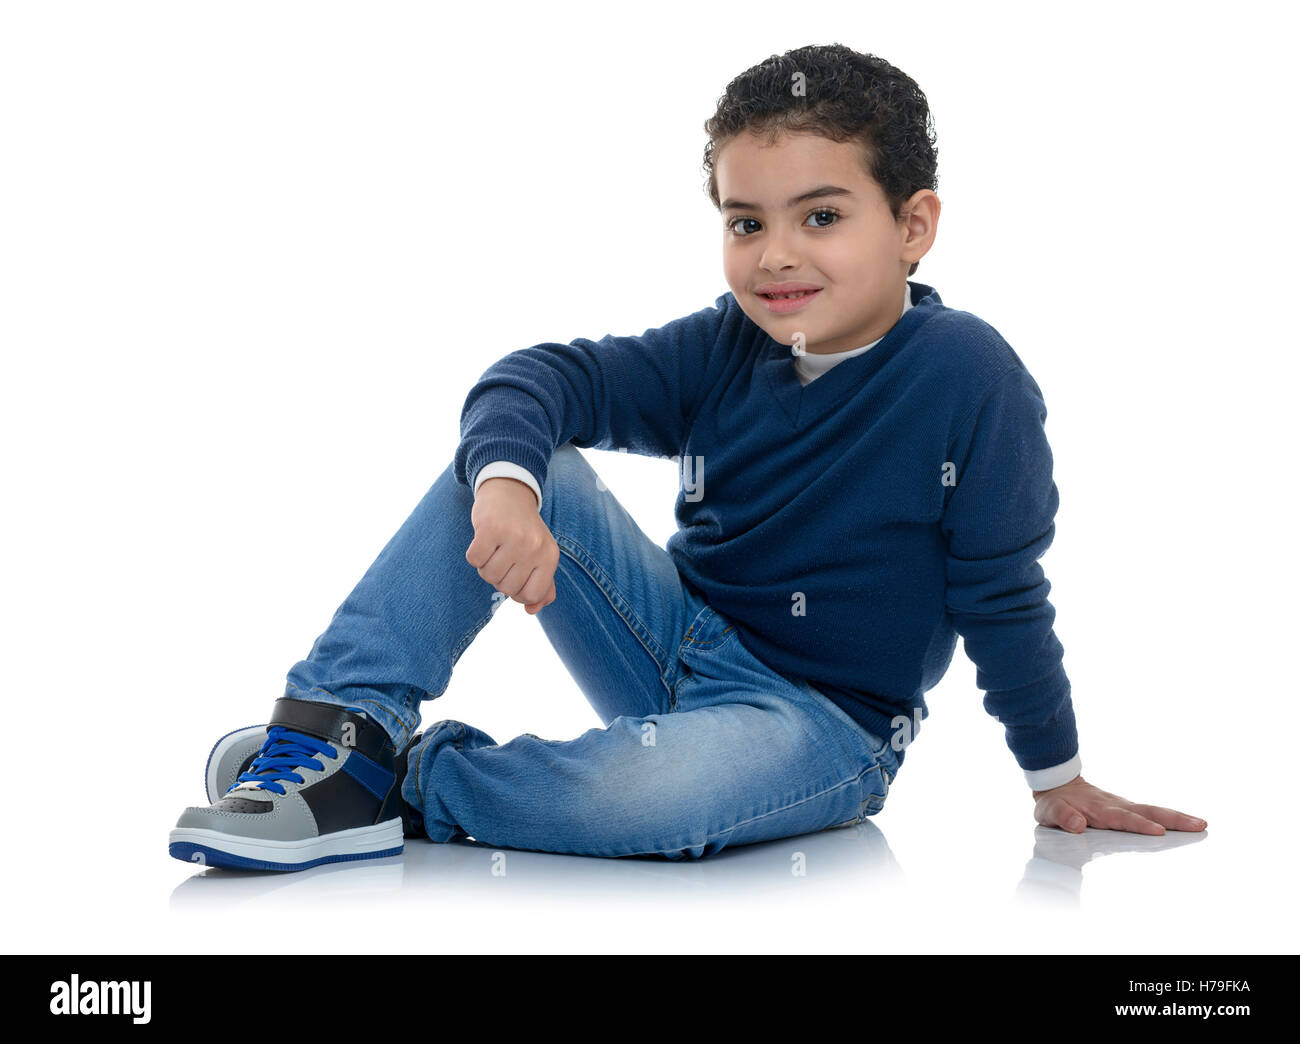 Cute Happy Fashion Boy Isolated on White Background - Stock Image